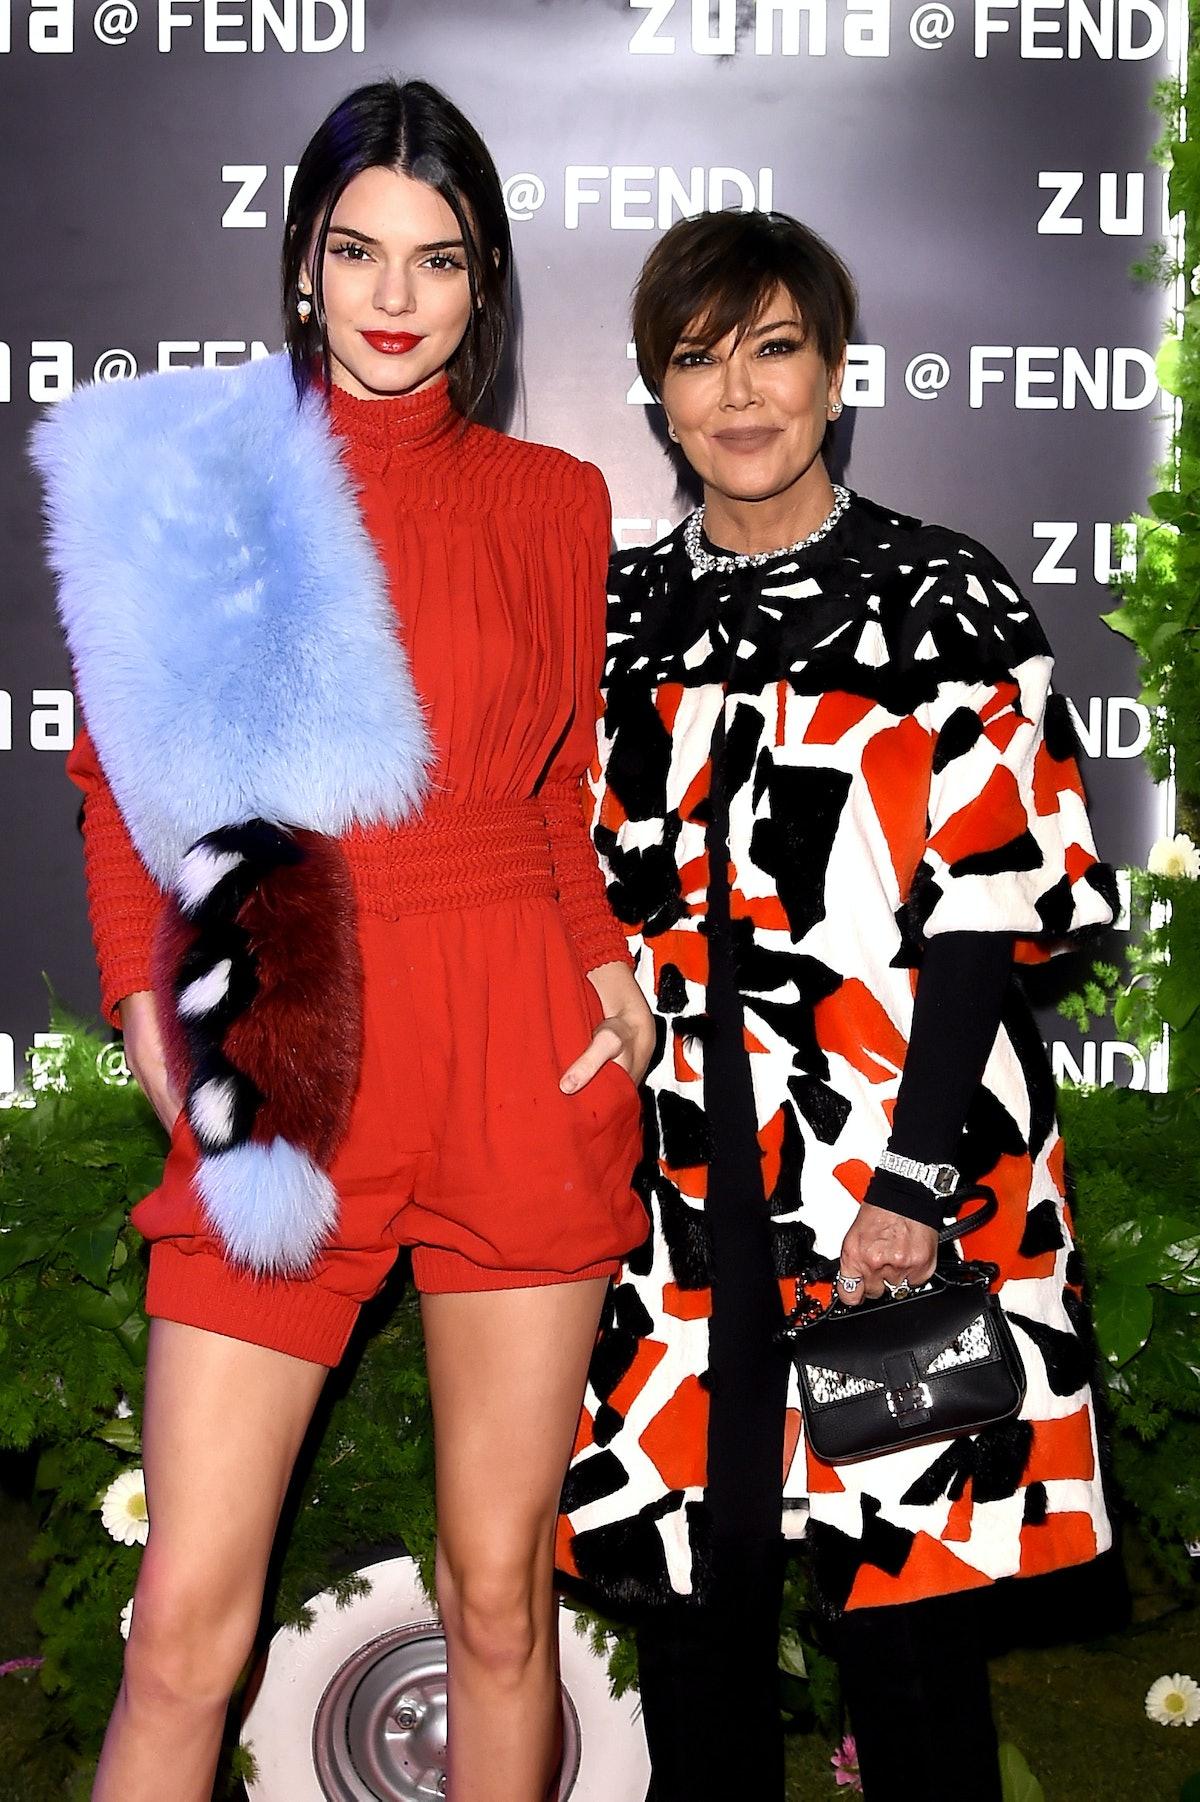 Kendall Jenner and Kris Jenner